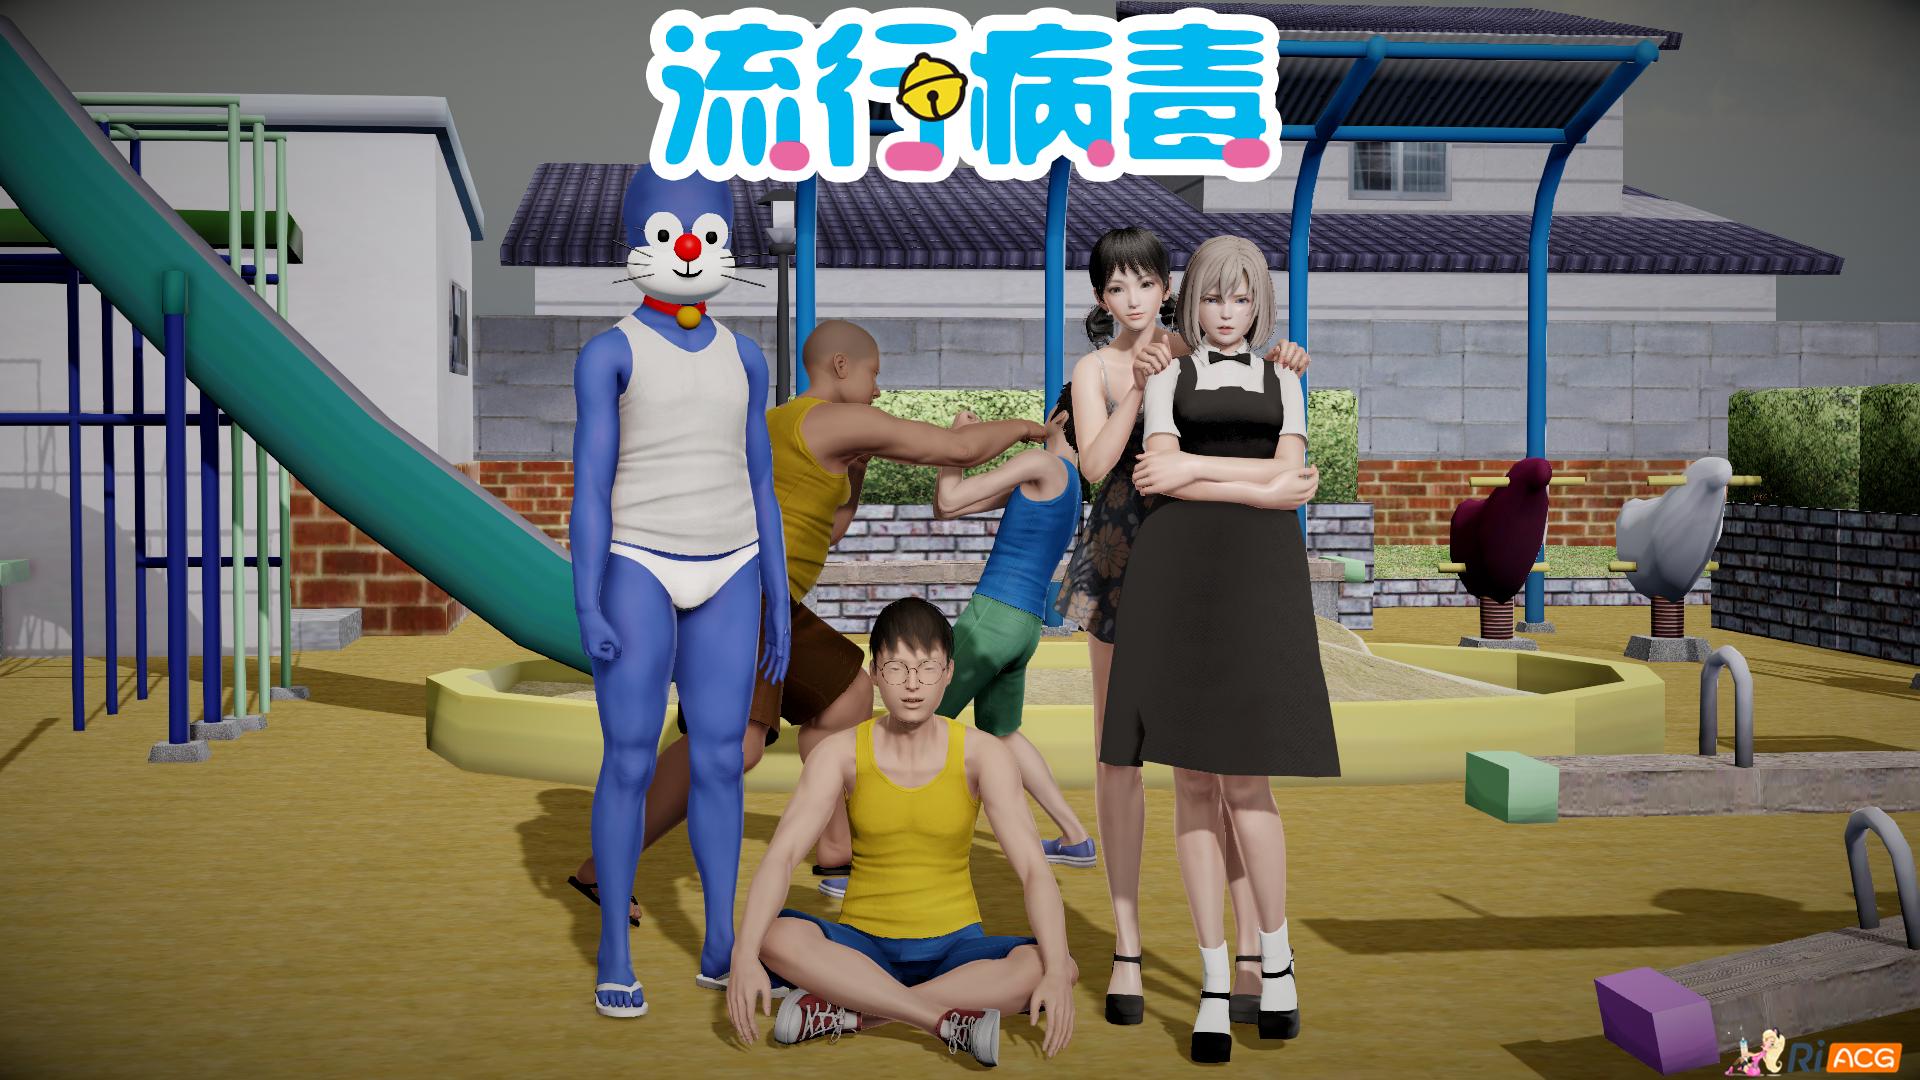 [3D国漫]bibibobibi的漫画合集[中文][度盘]